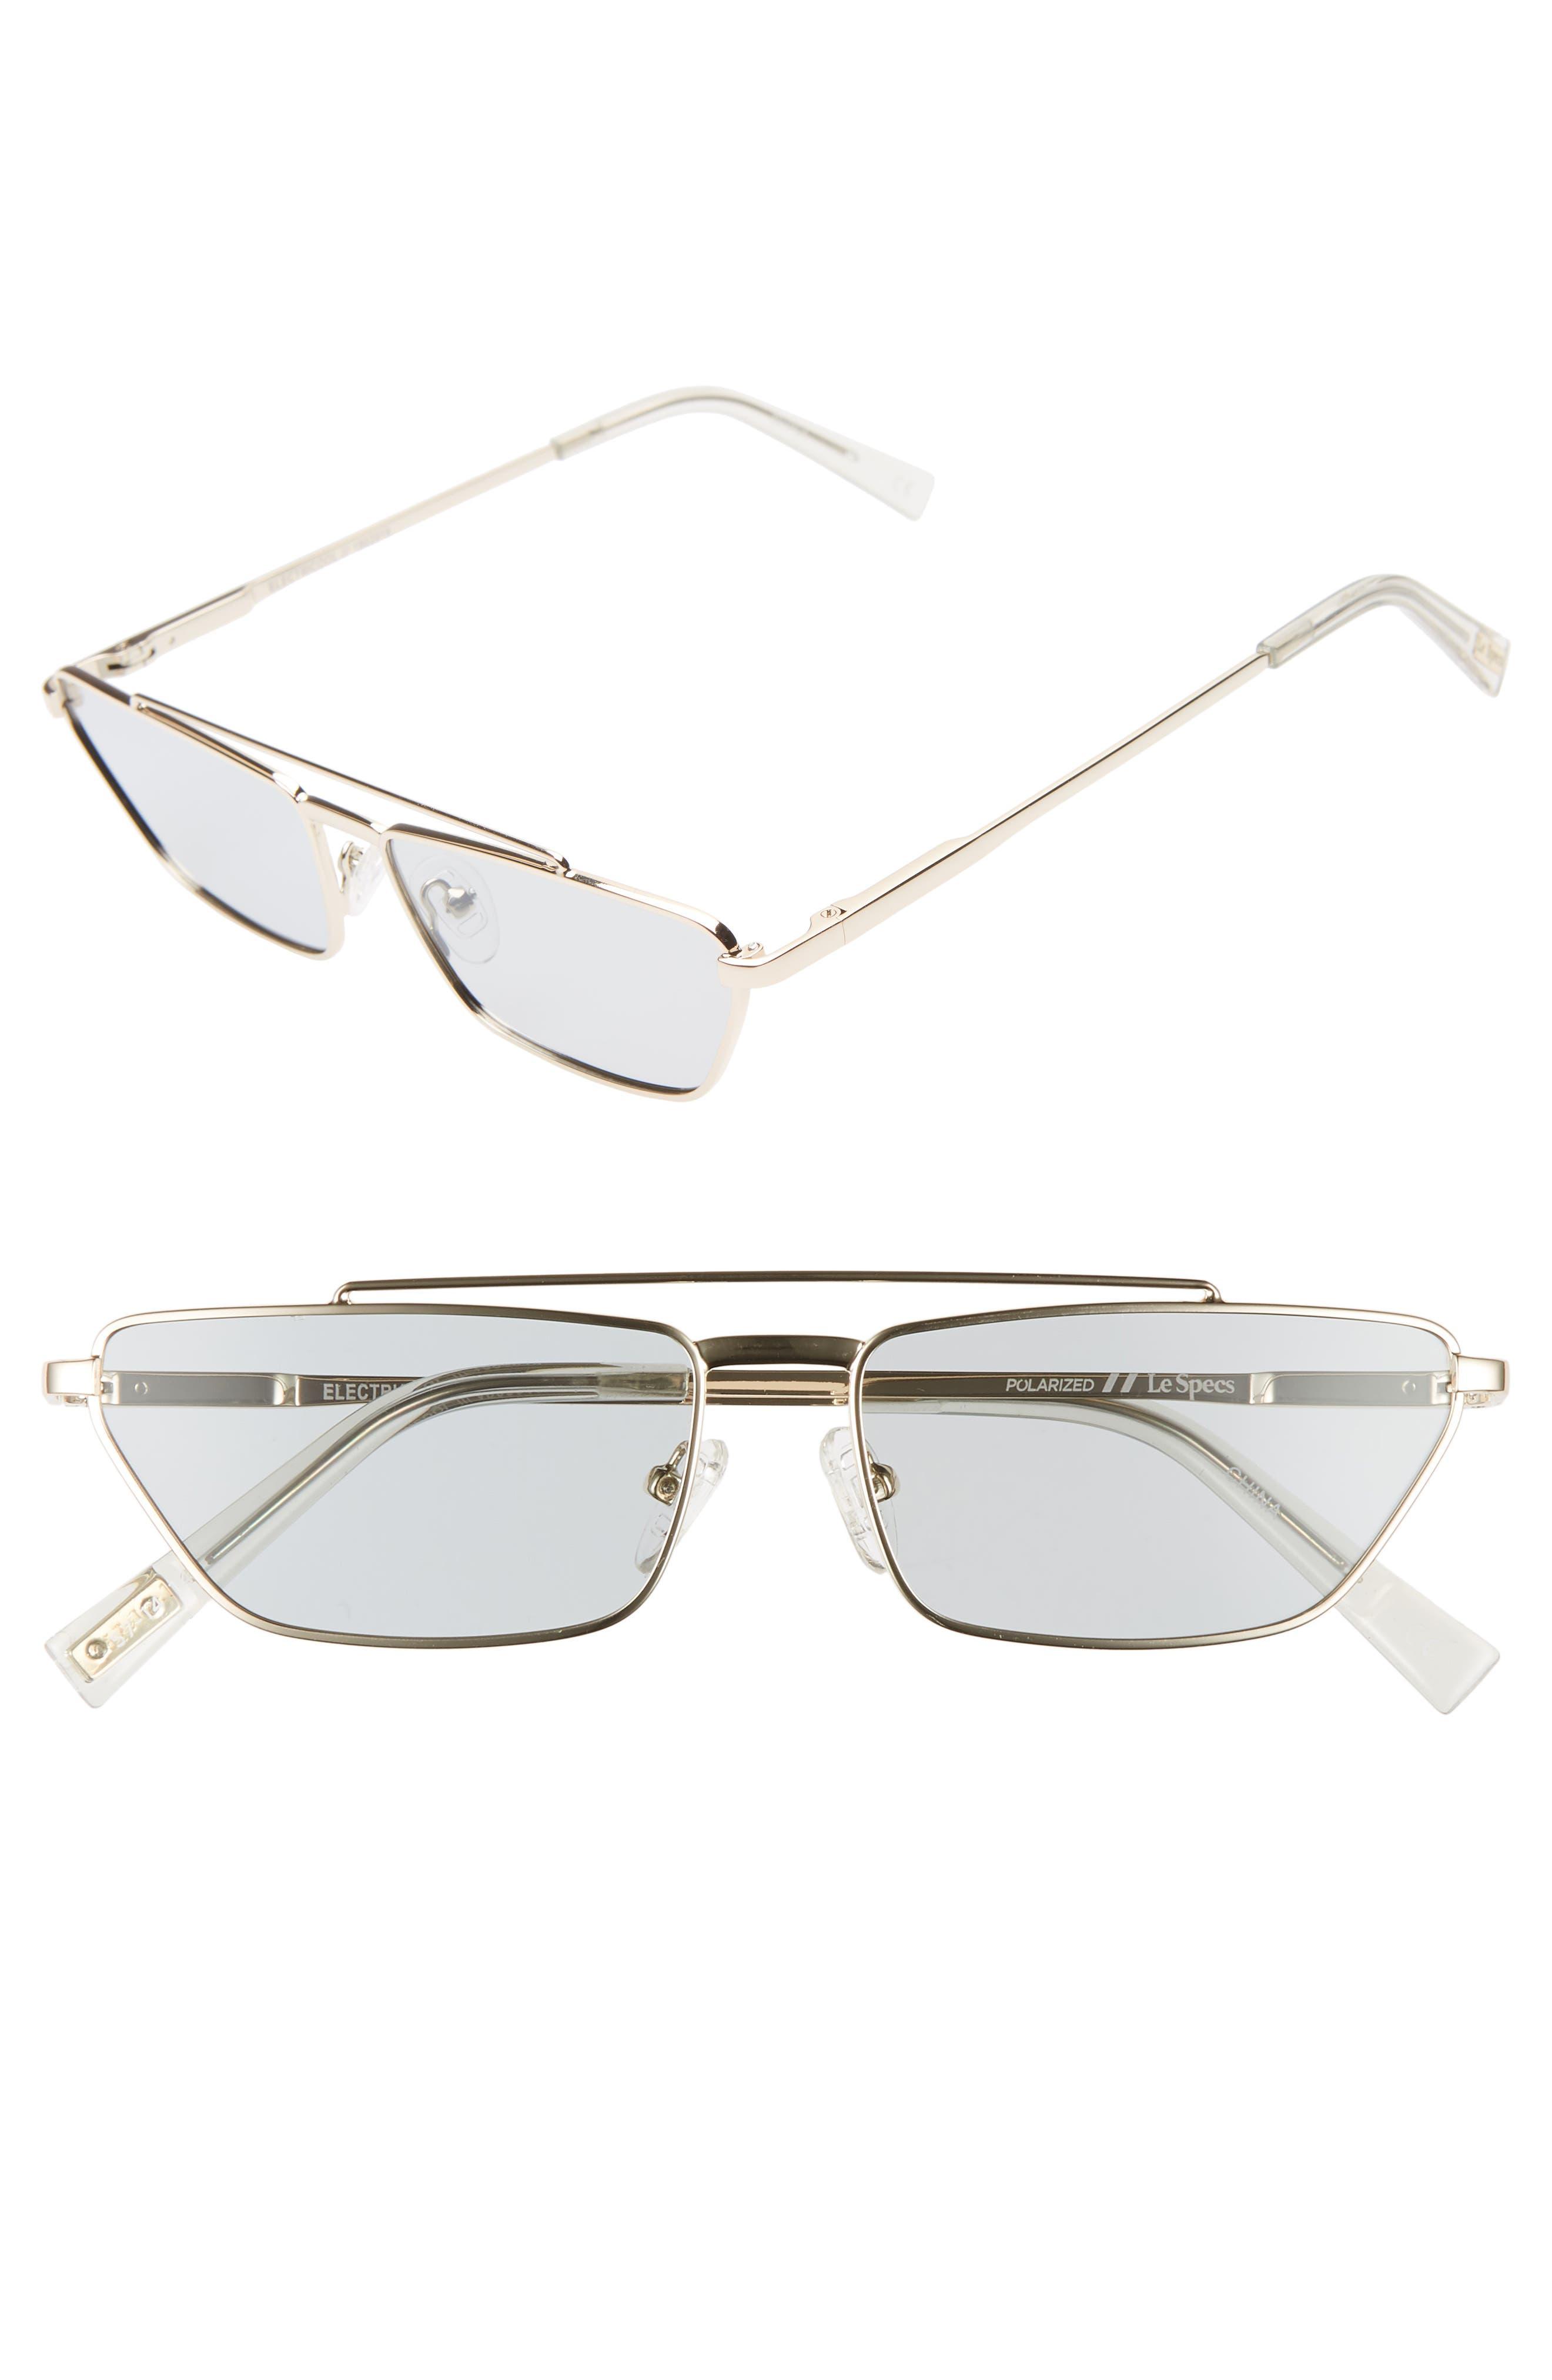 Le Specs Electricool 57Mm Polarized Cat Eye Aviator Sunglasses - Gold/ Grey Tint